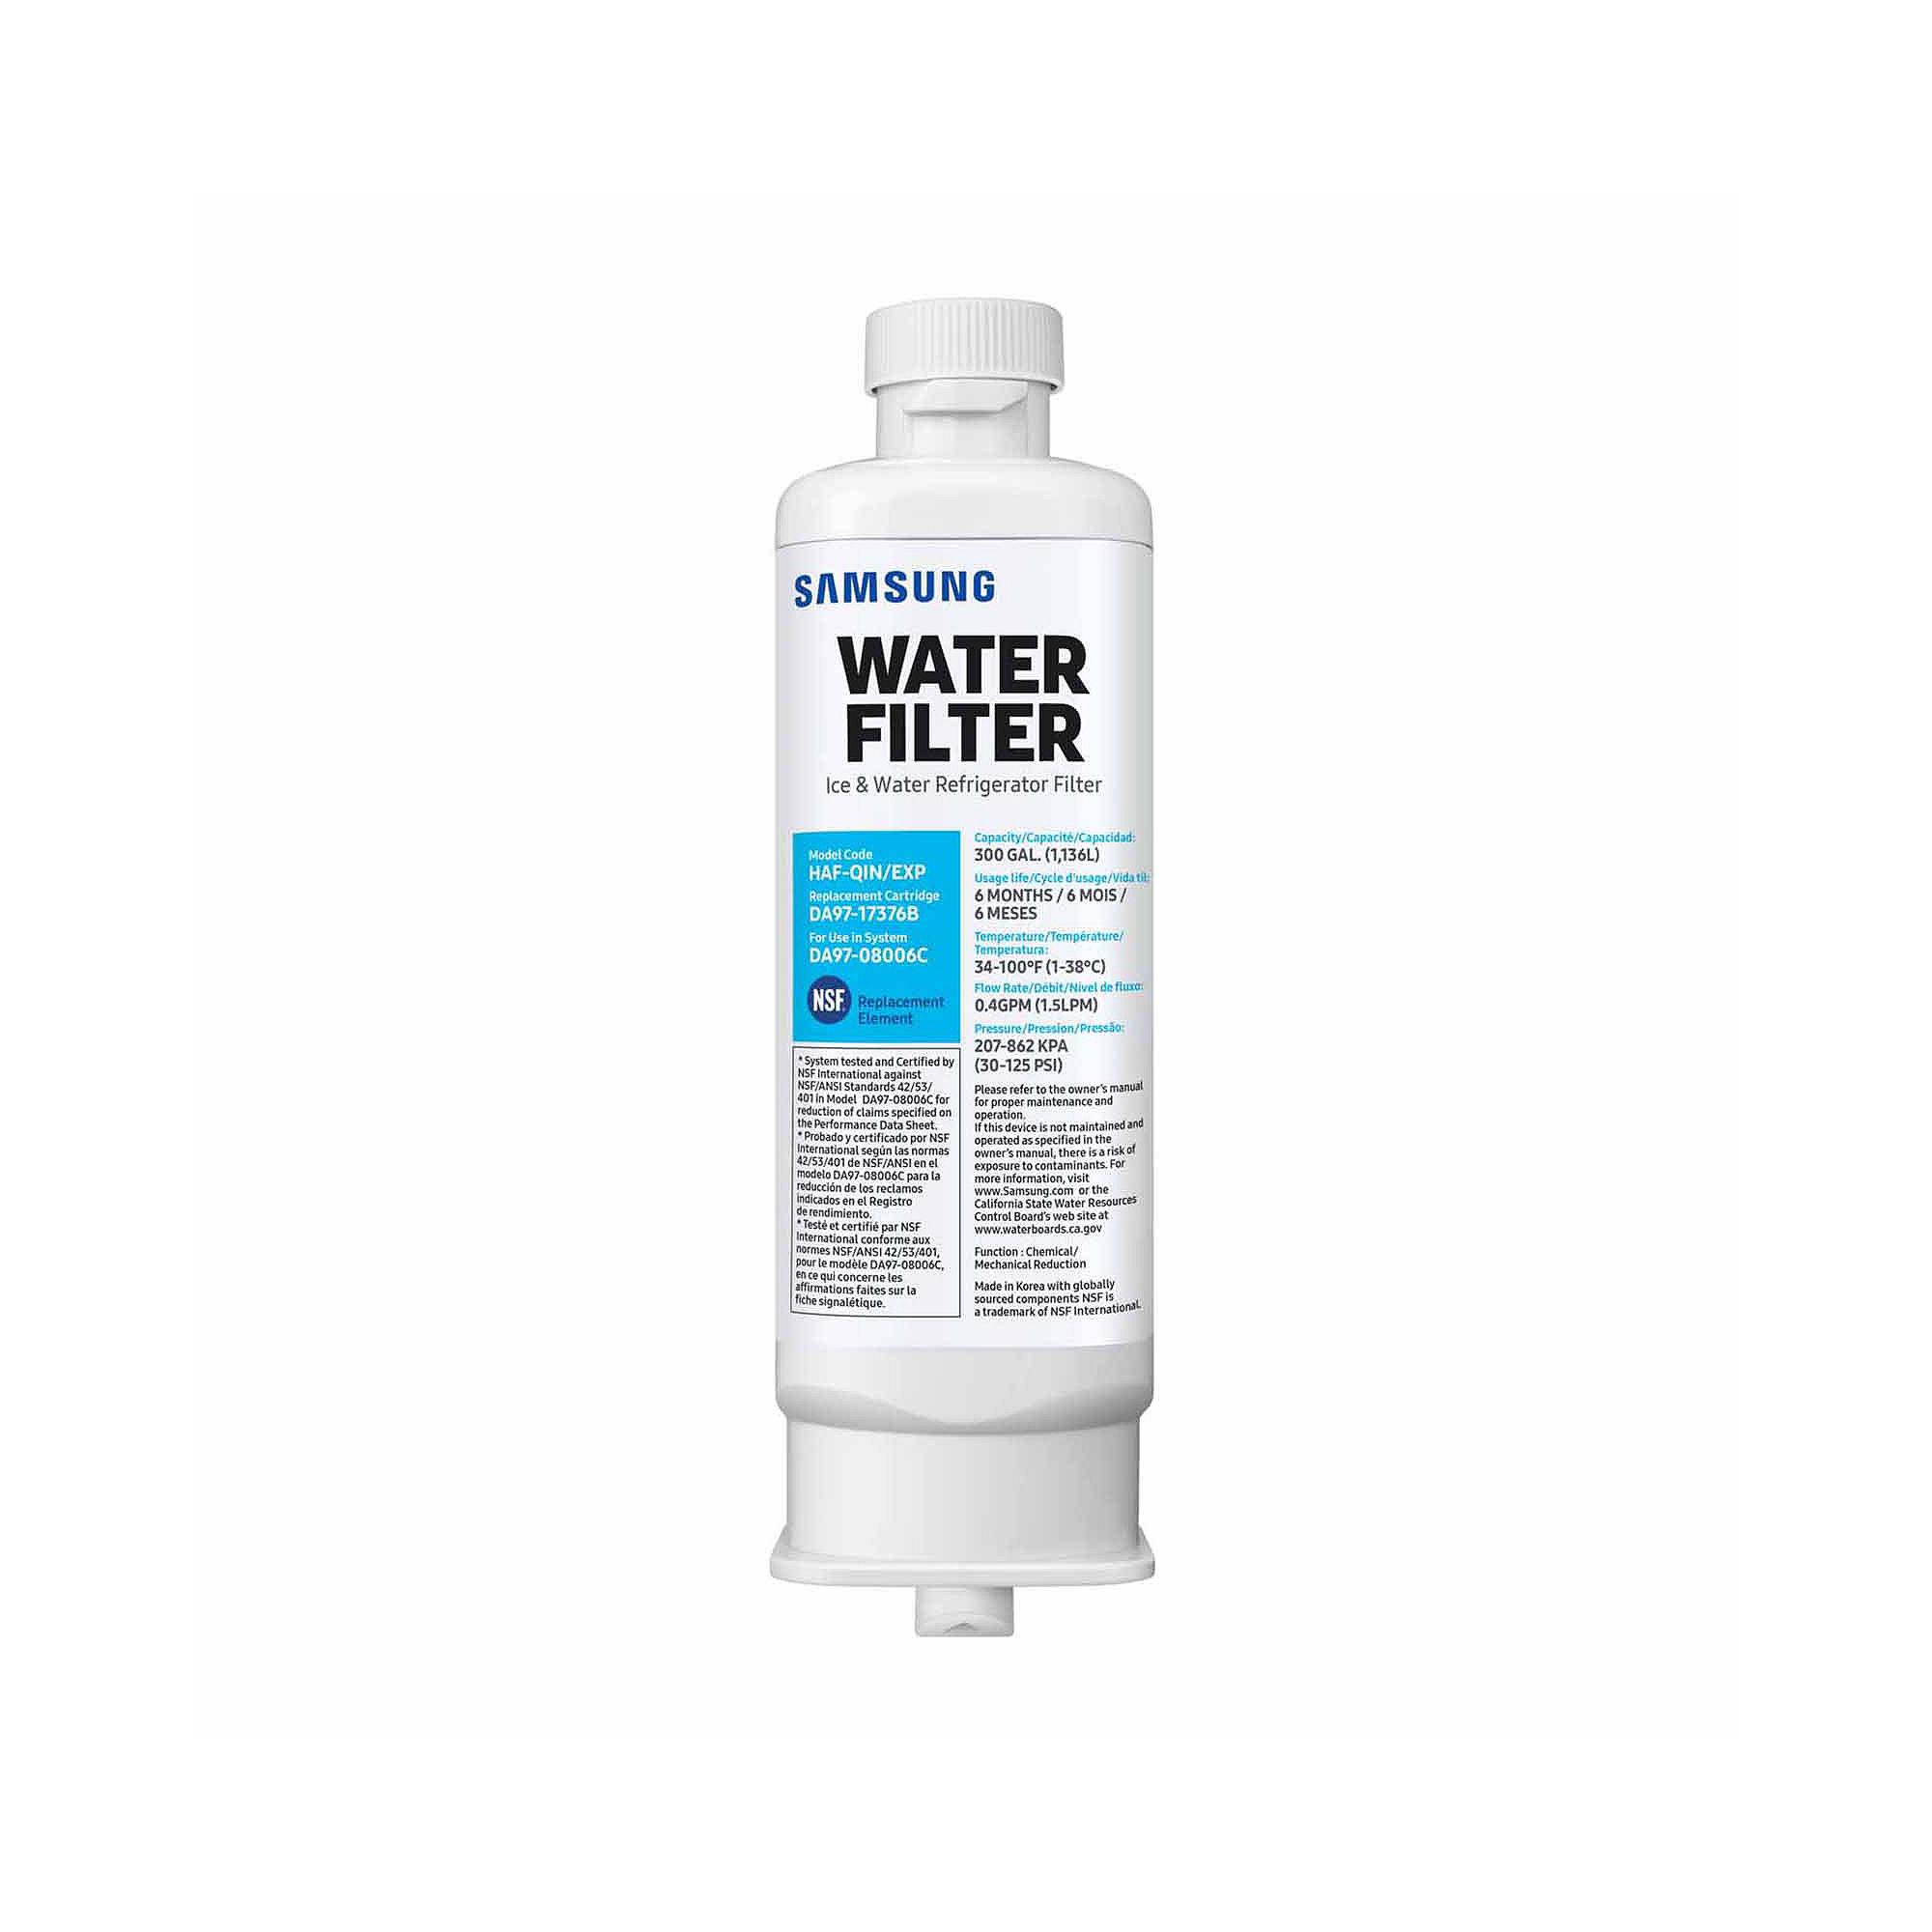 Samsung Refrigerator Water Filter - HAF-QIN/EXP